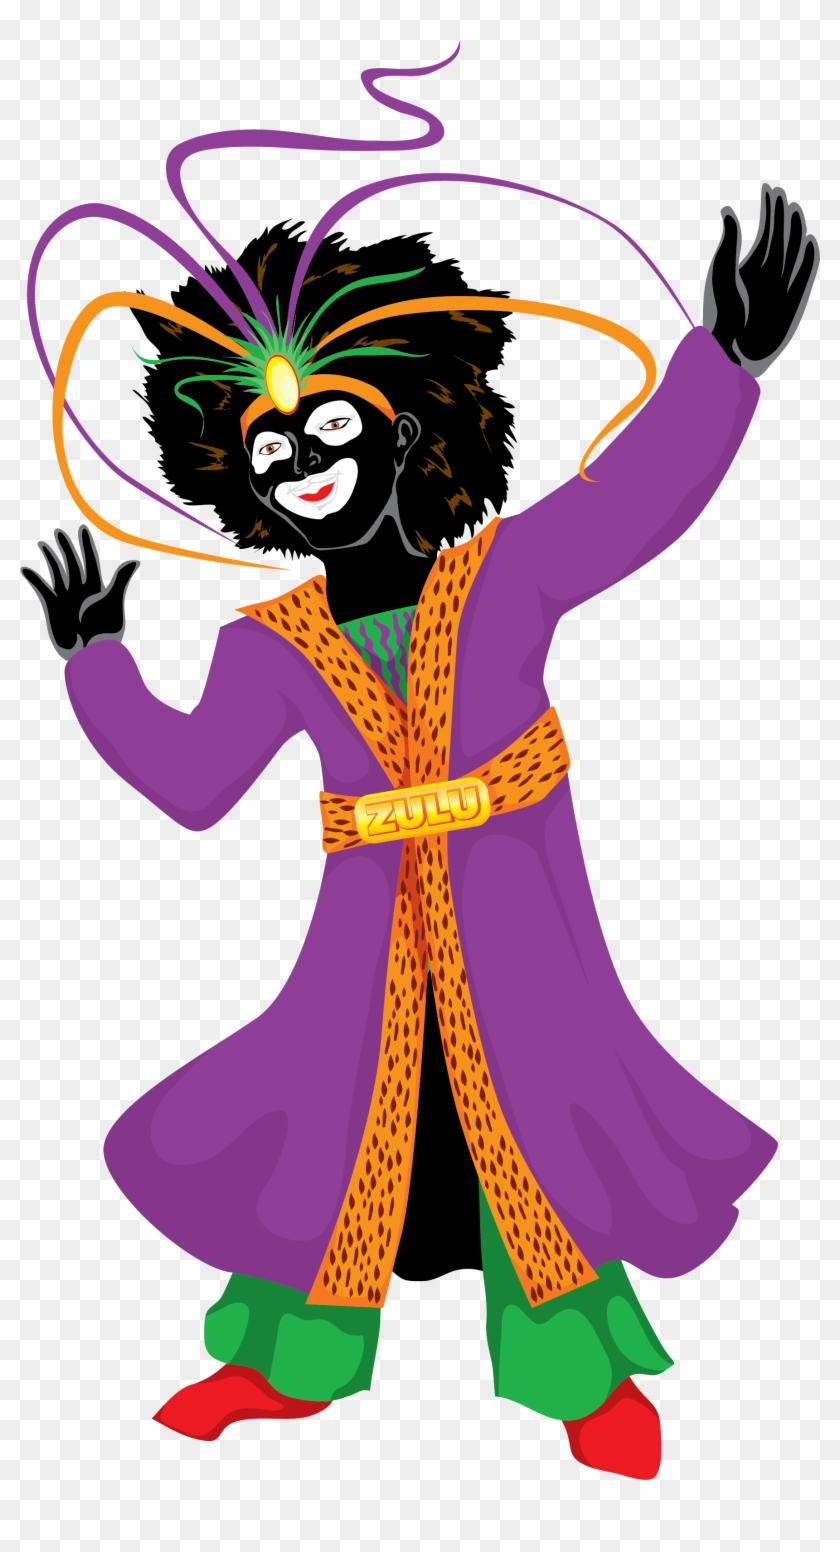 Mardi Gras King - Illustration #35040